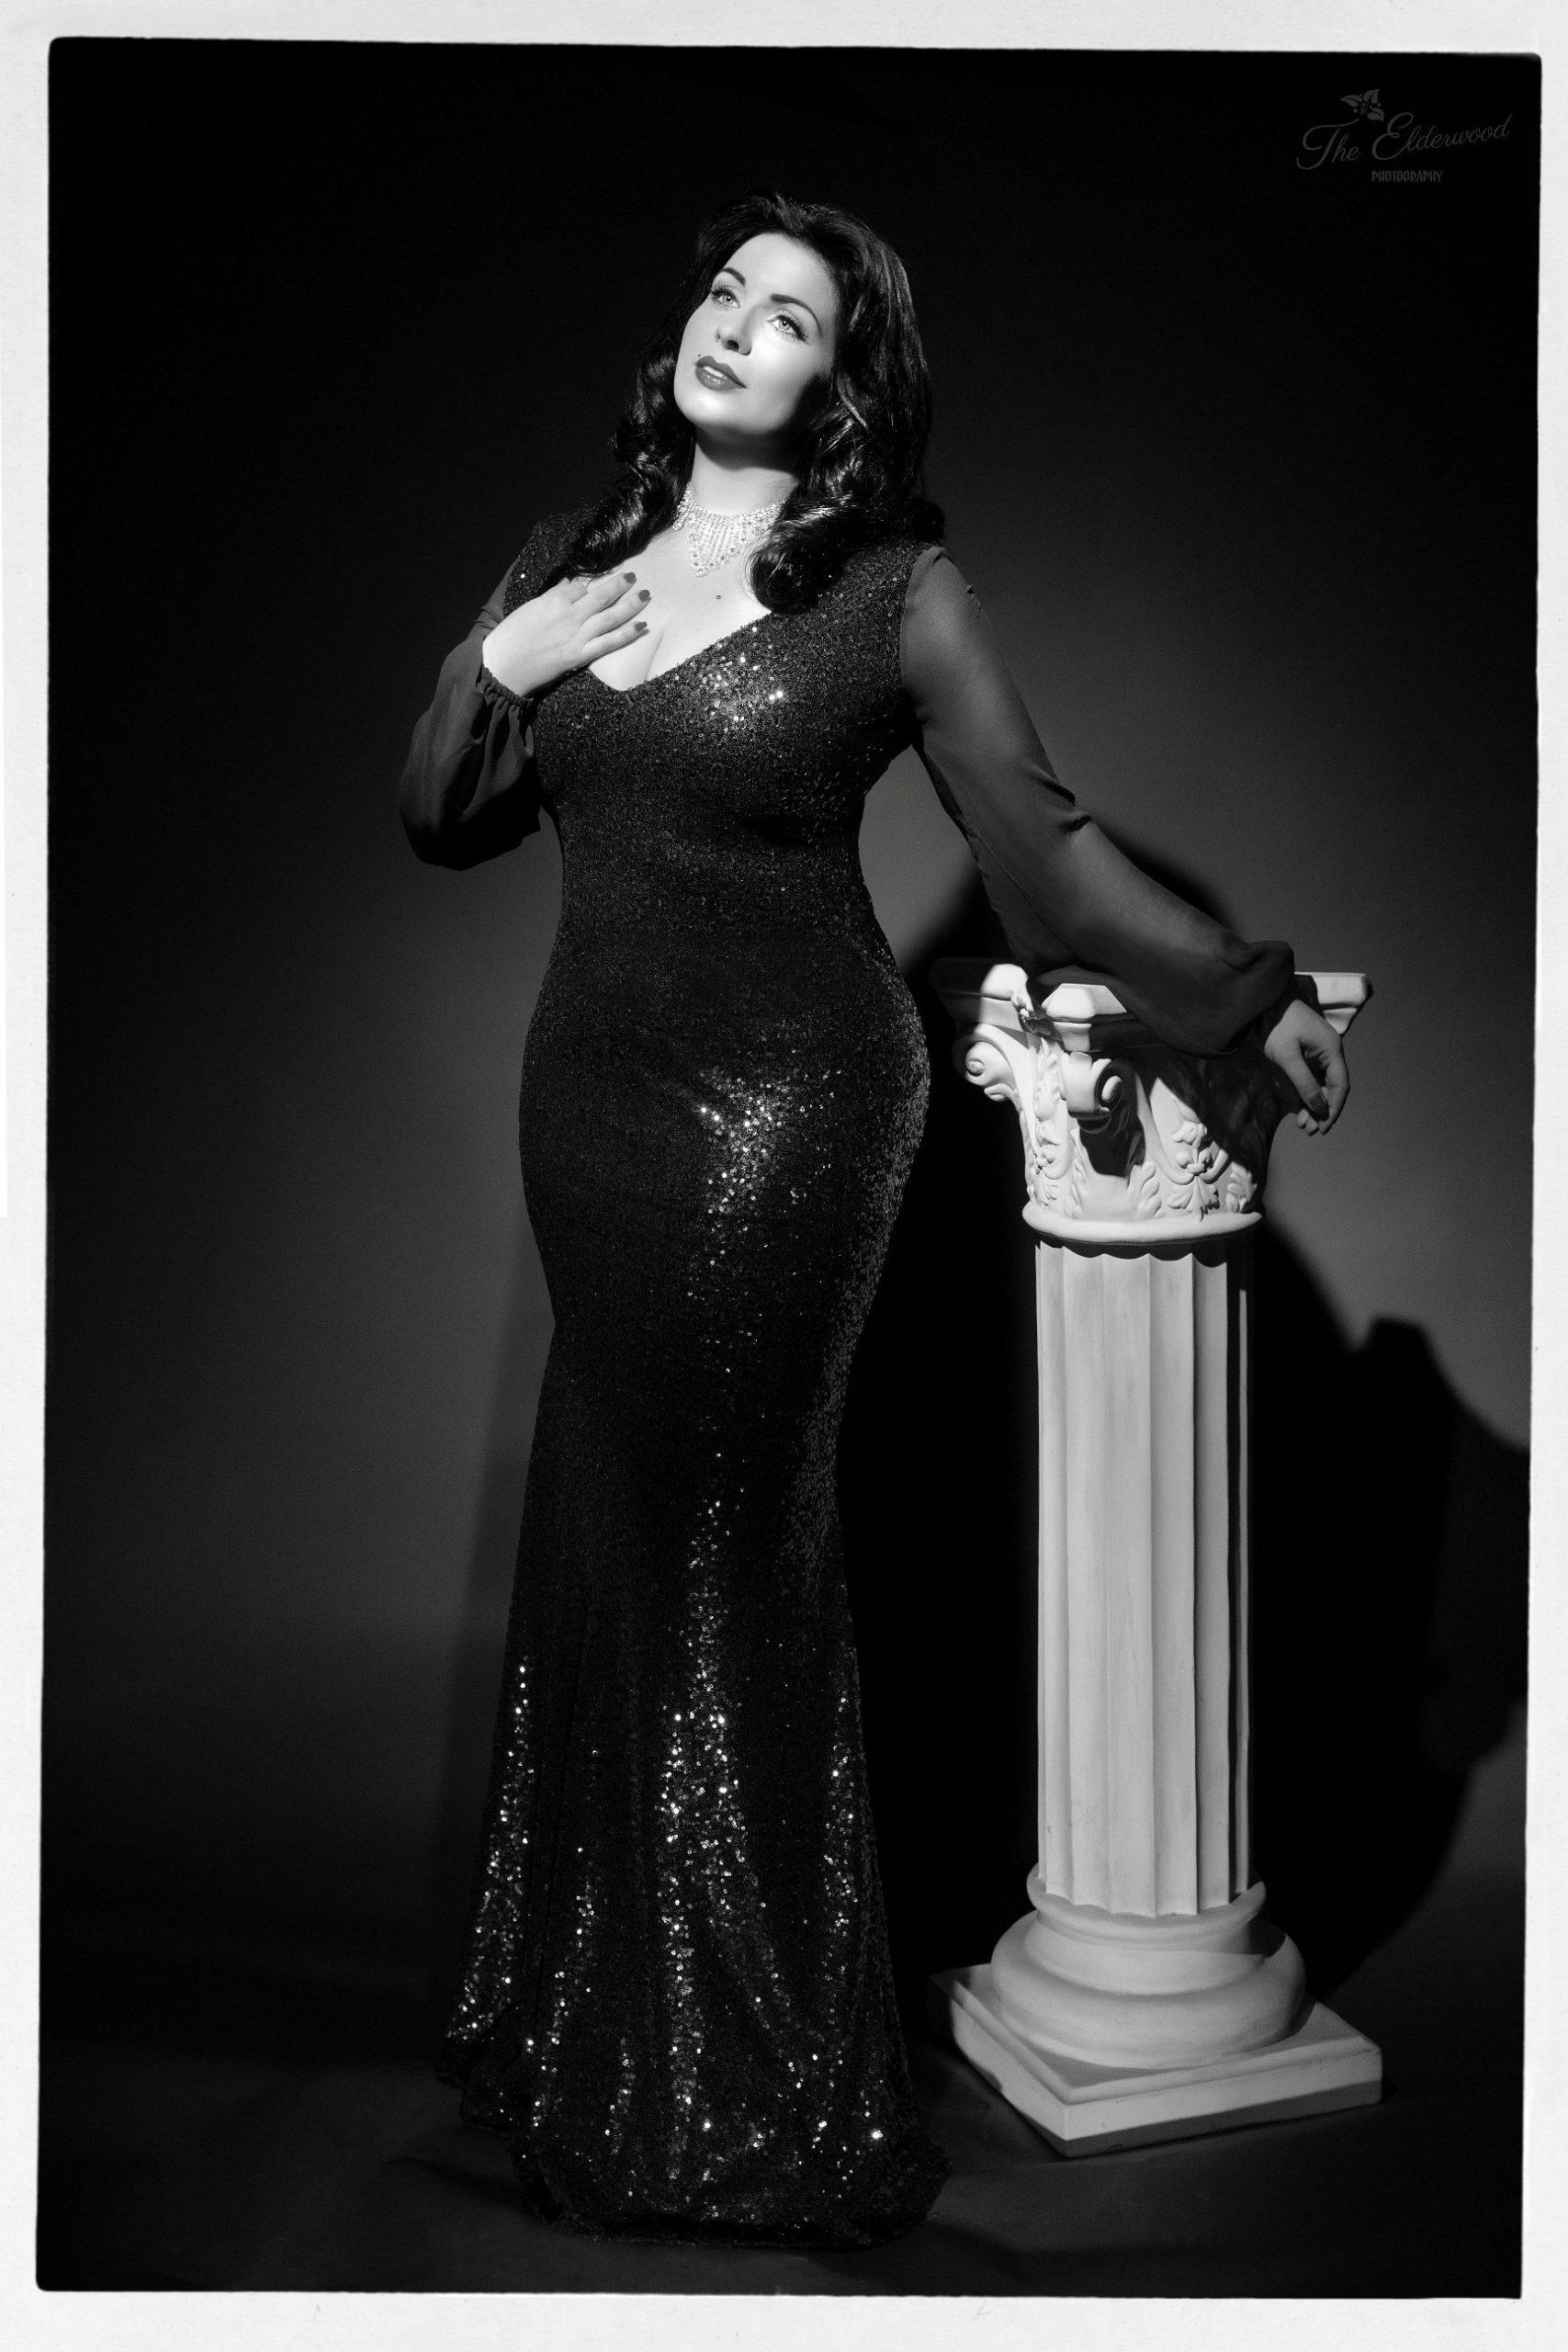 Miss Velvet Ivory-(C) The Elderwood Photography